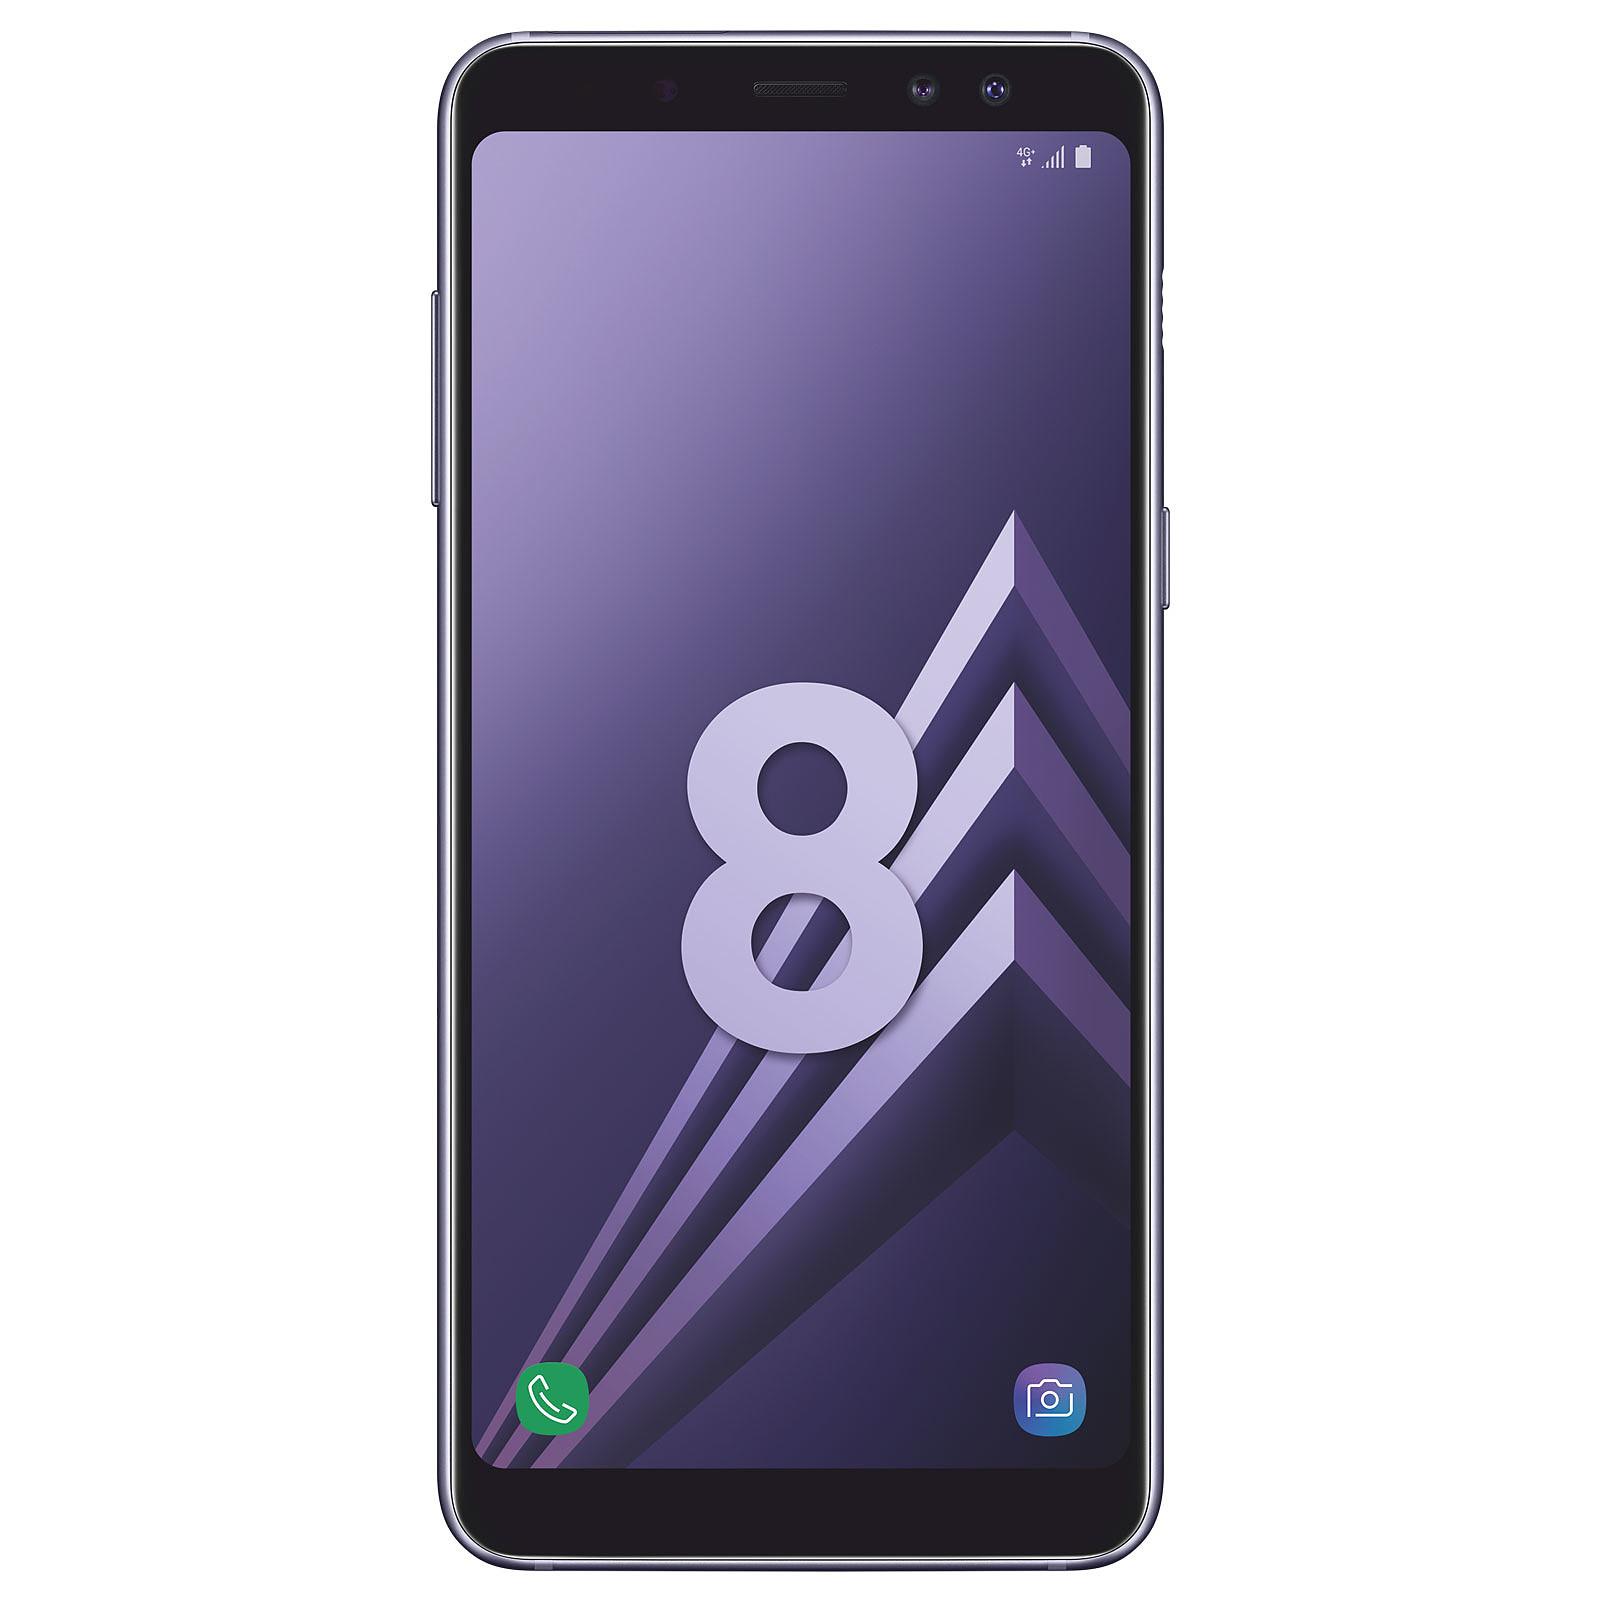 Samsung Galaxy A8 Orchidée - Mobile   smartphone Samsung sur LDLC.com 6f9db4a88ccc